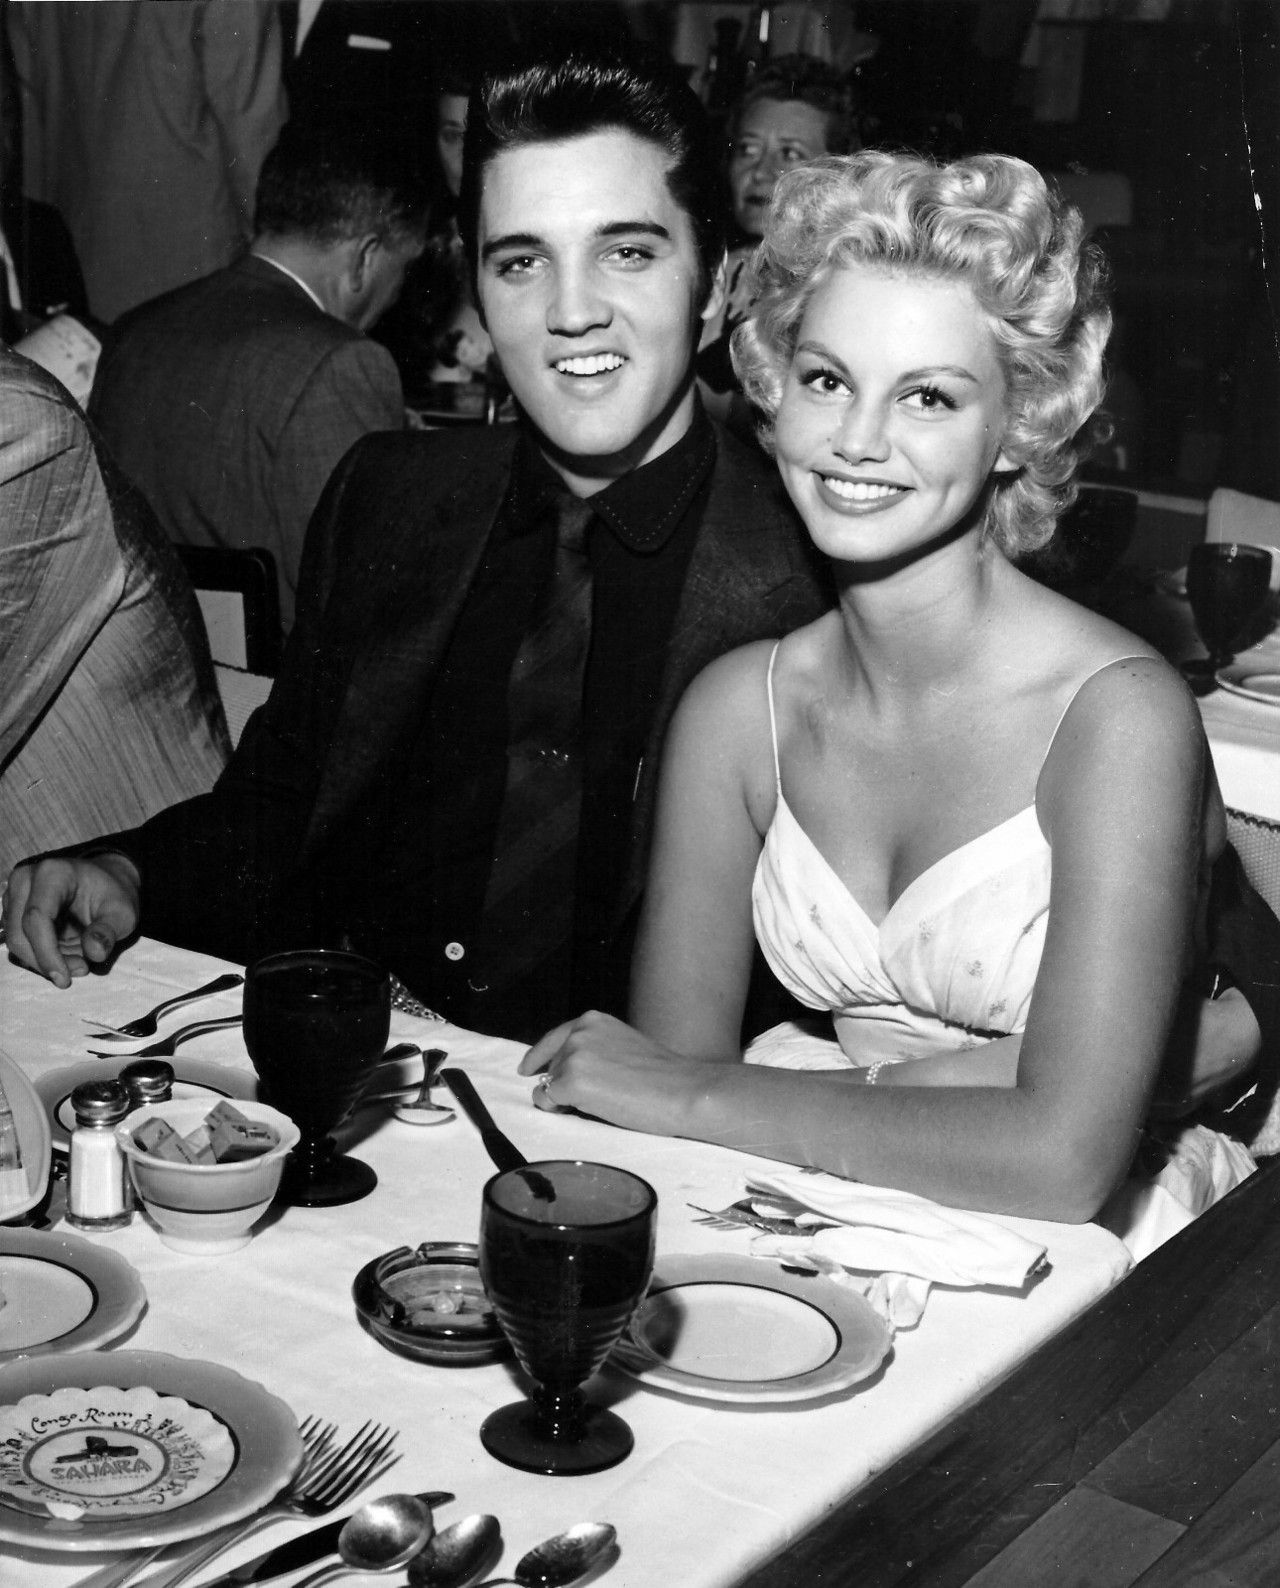 Presley show girl